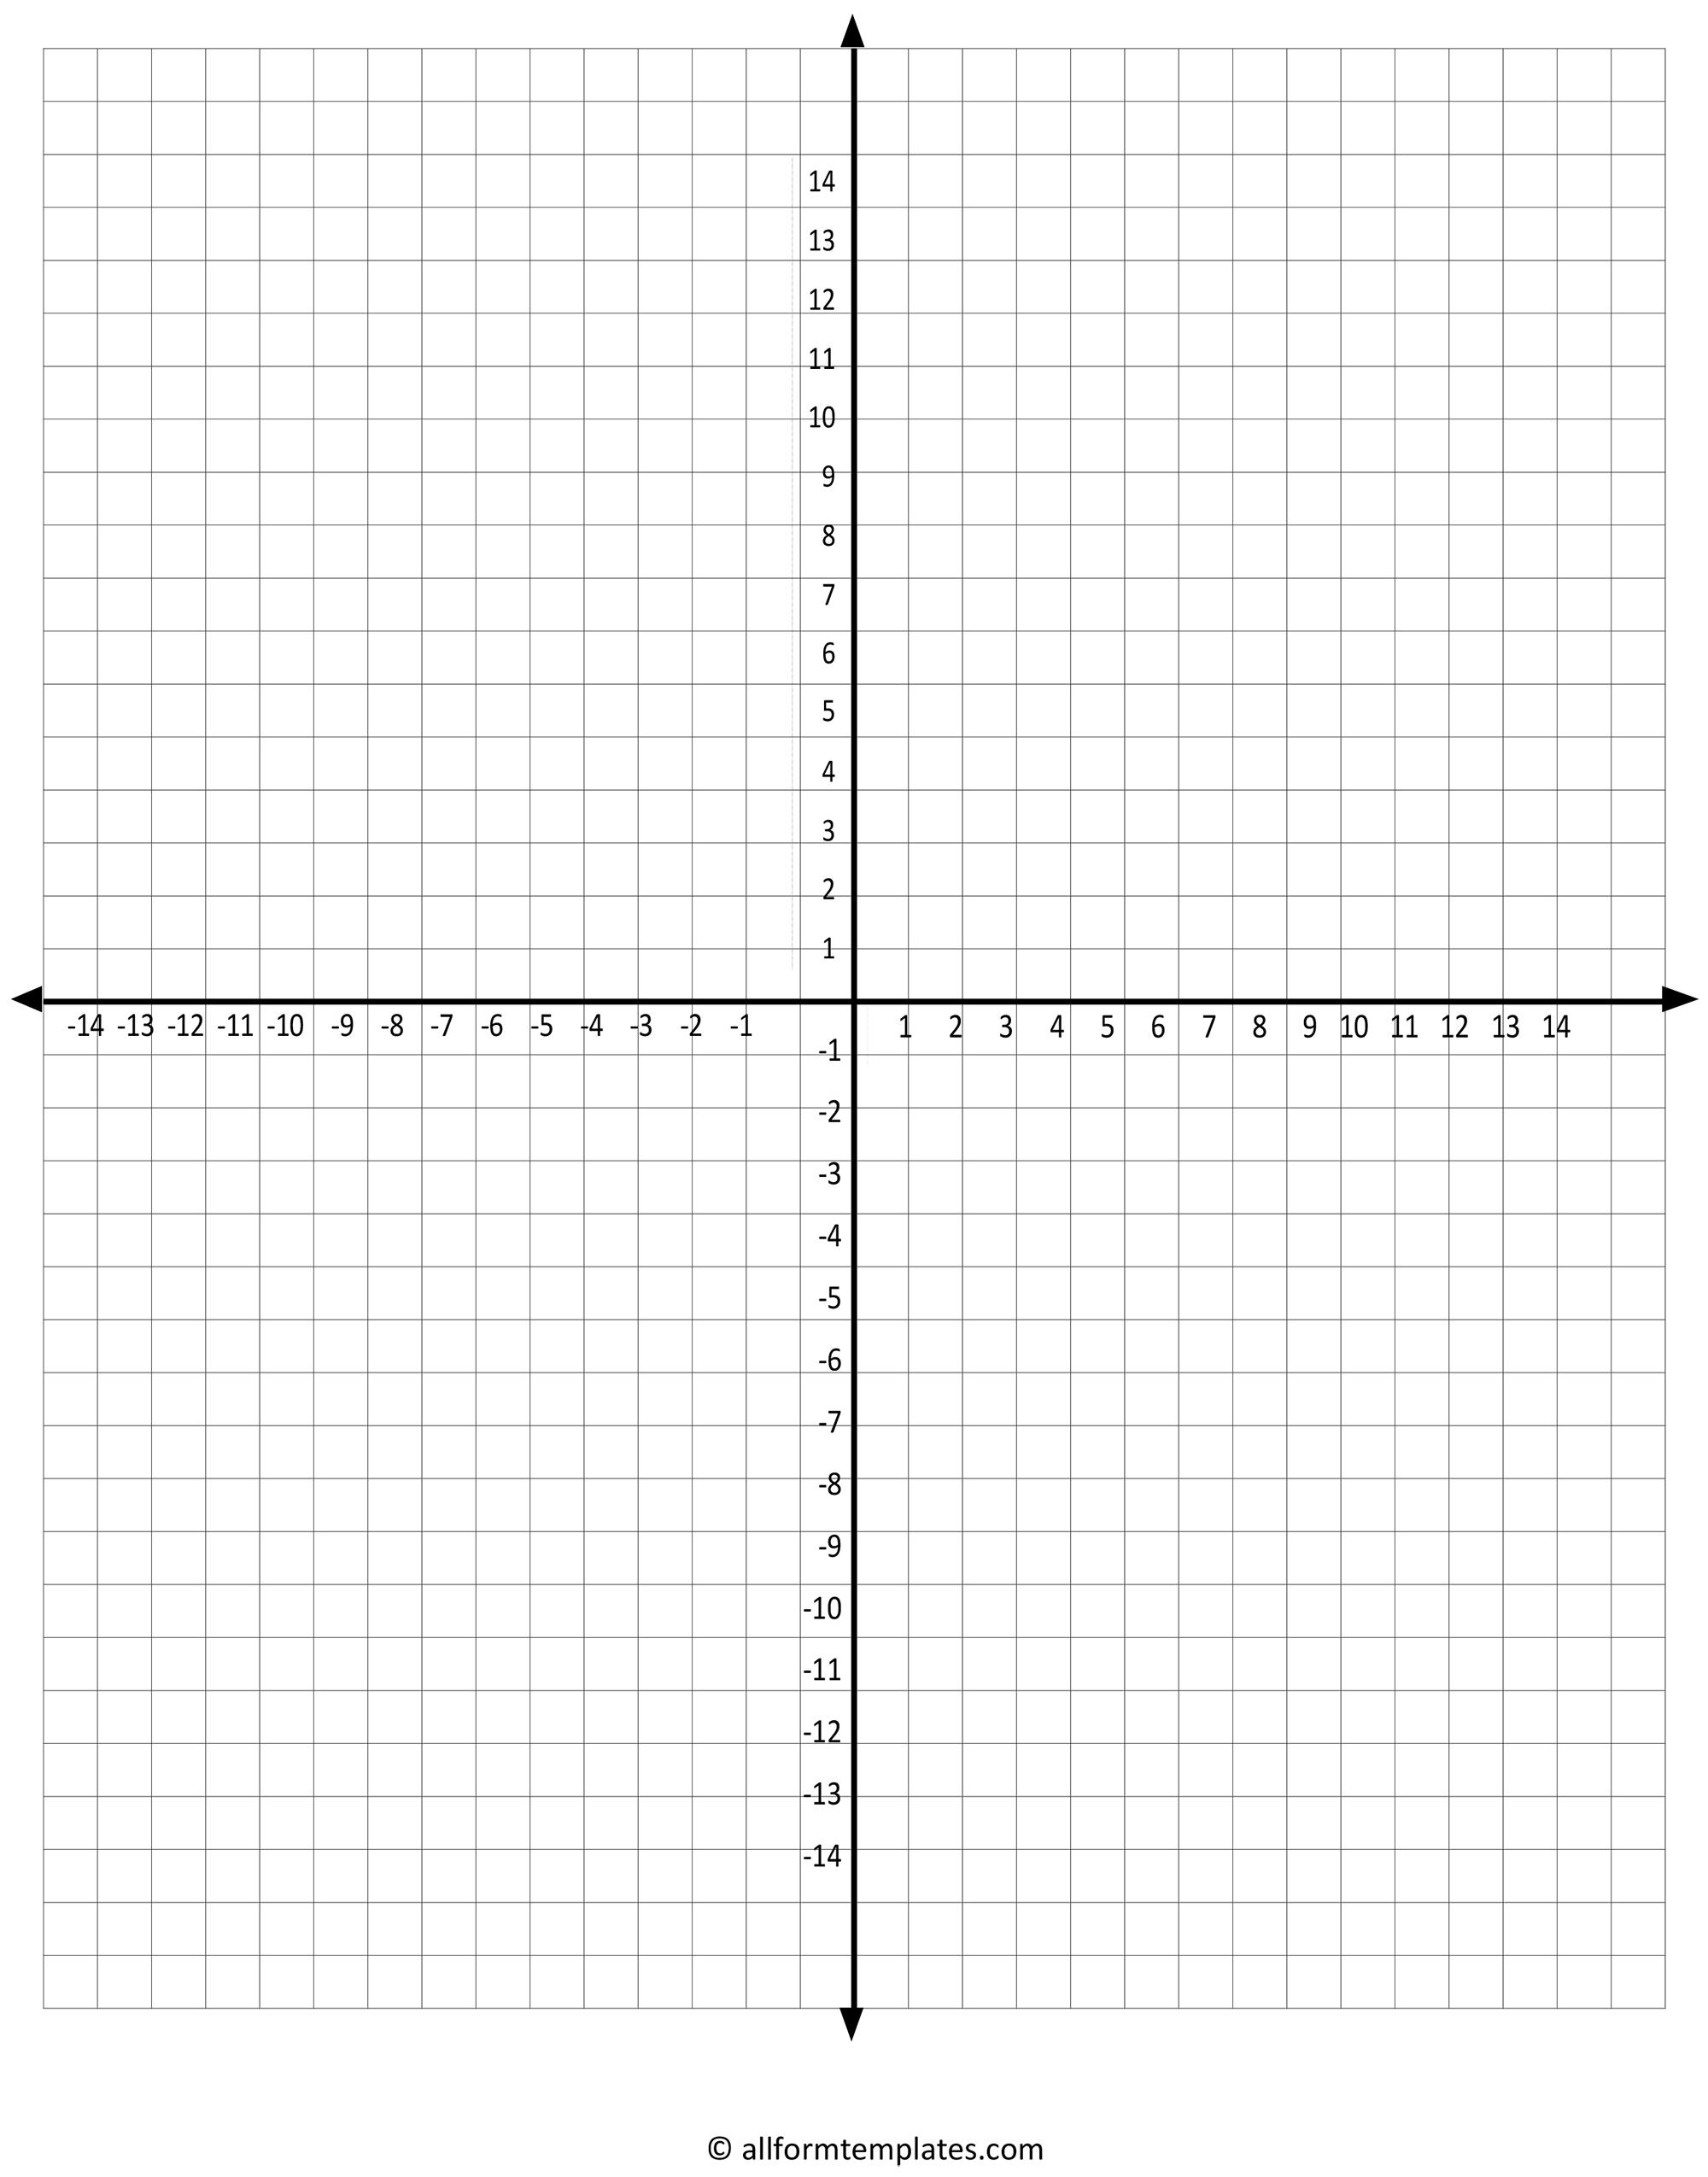 Coordinate-grid-paper-HD